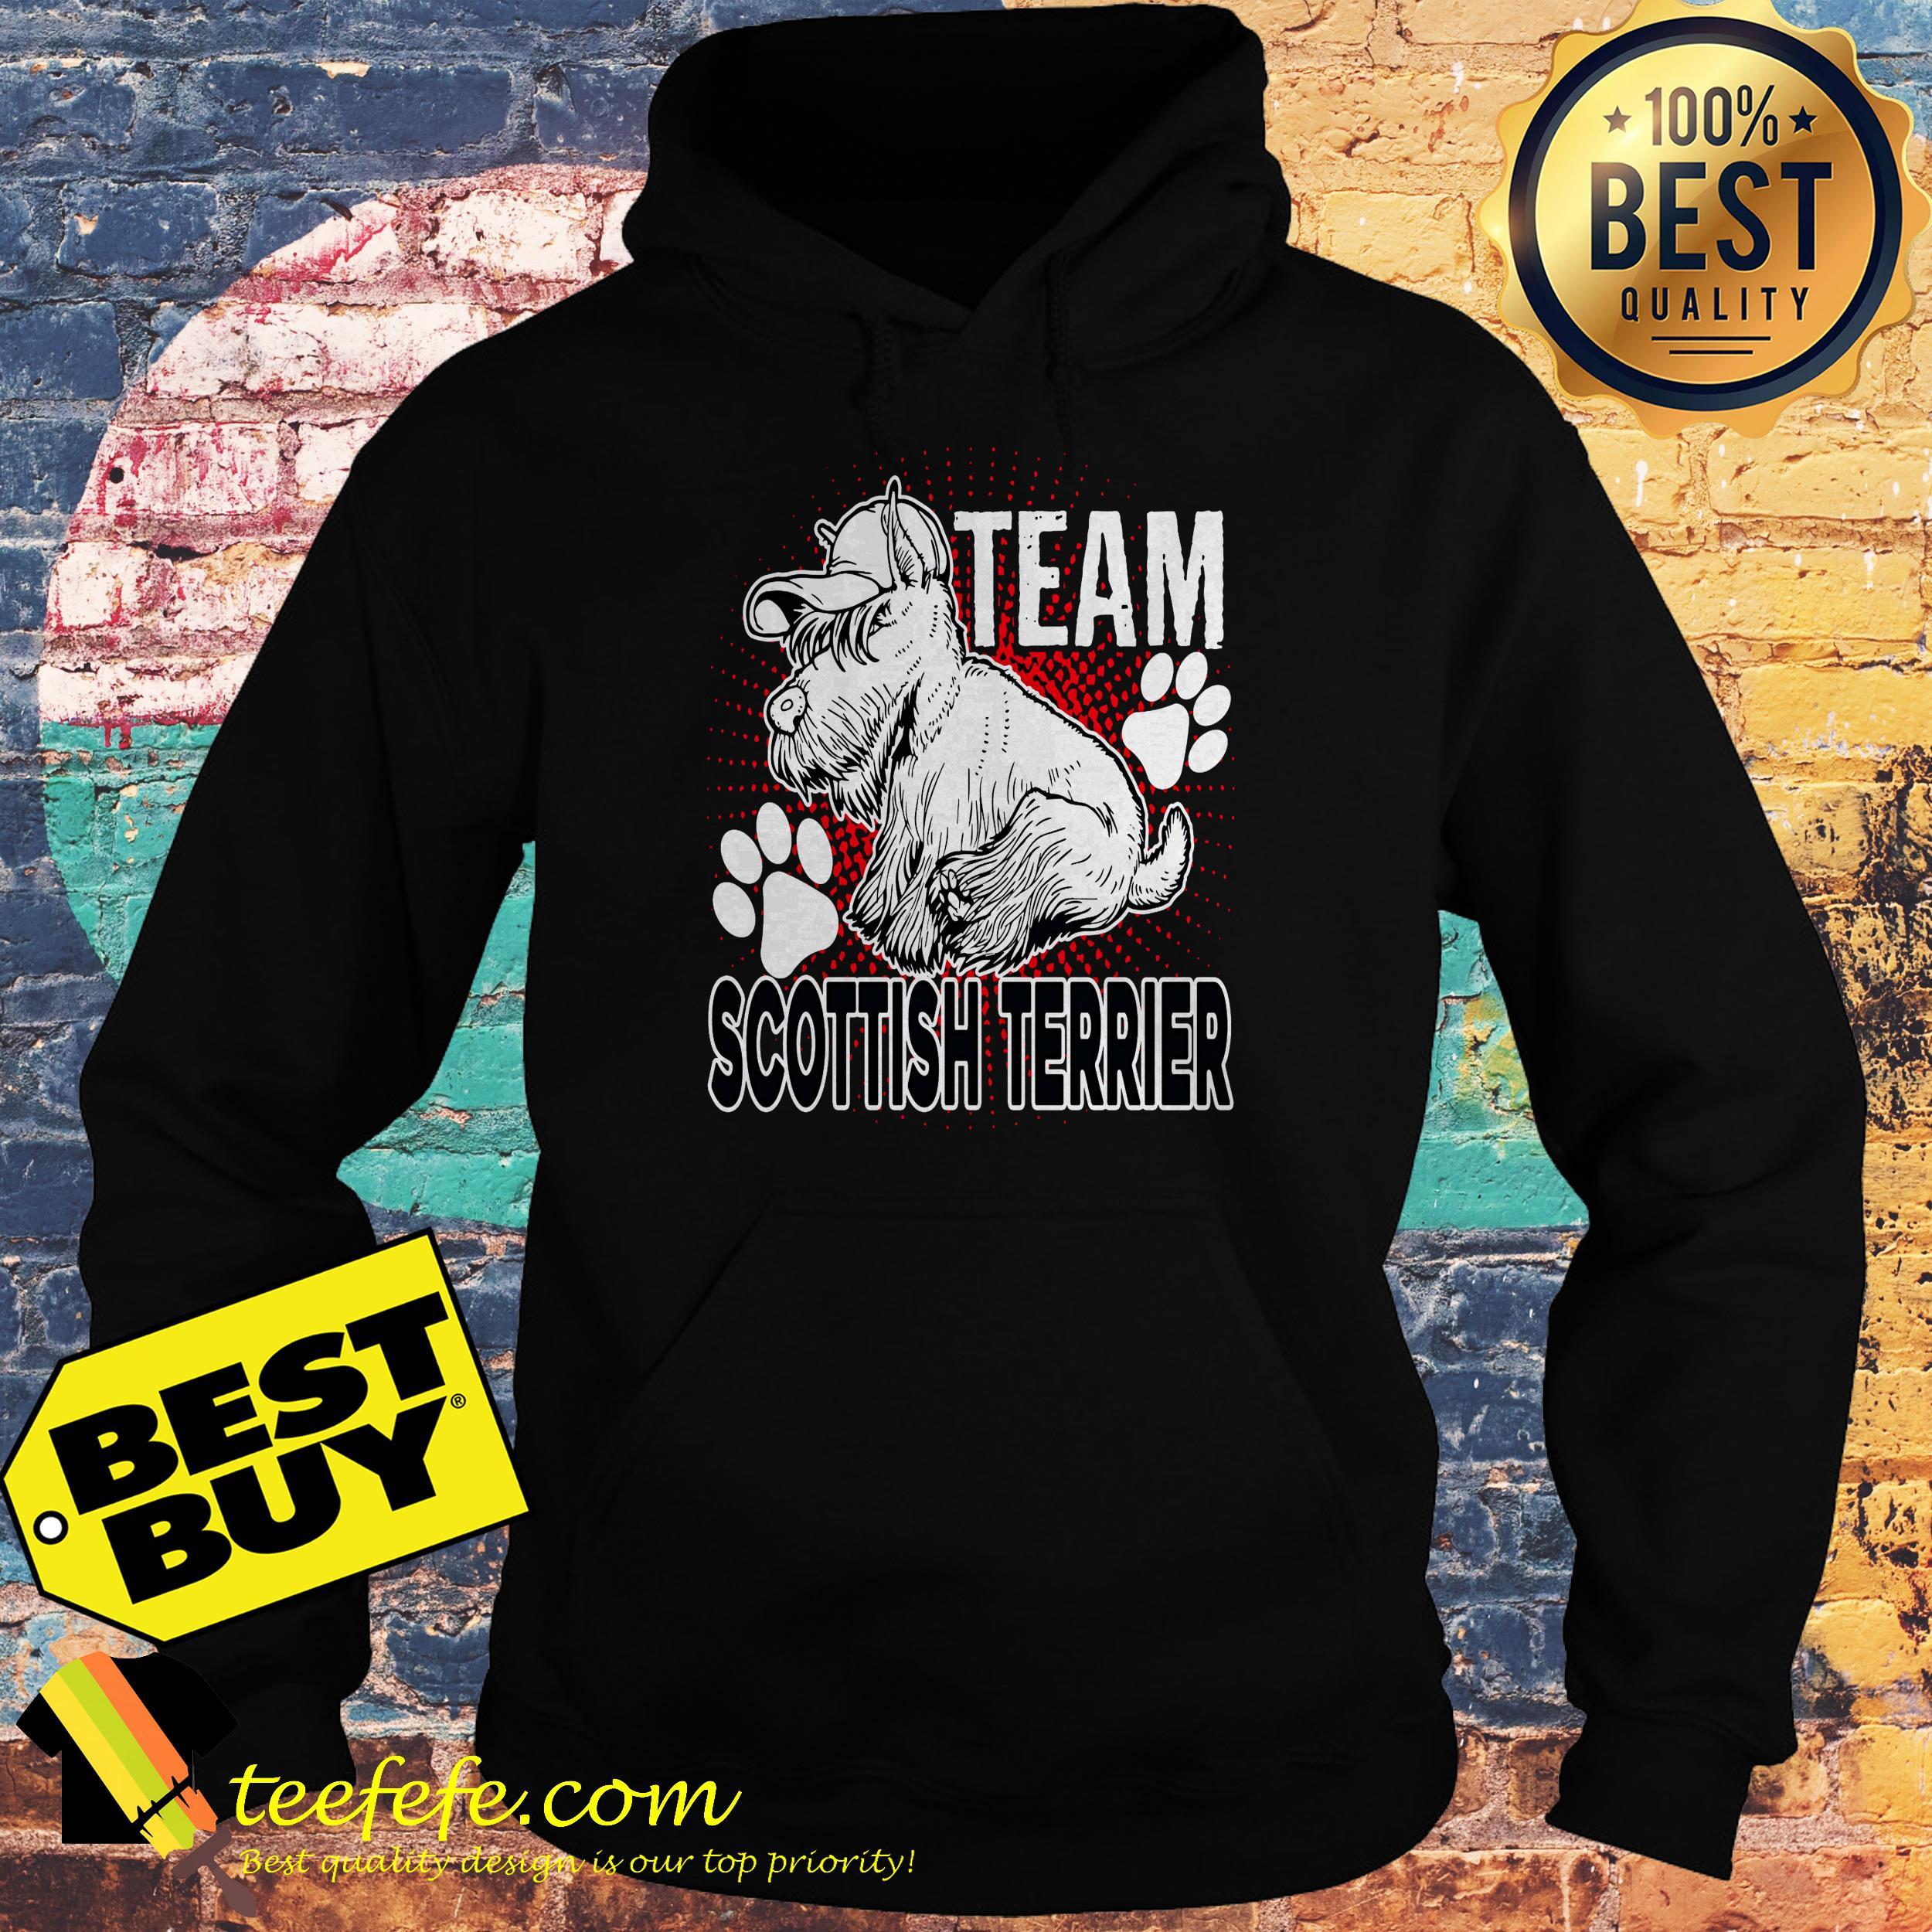 Team Scottish Terrier hoodie